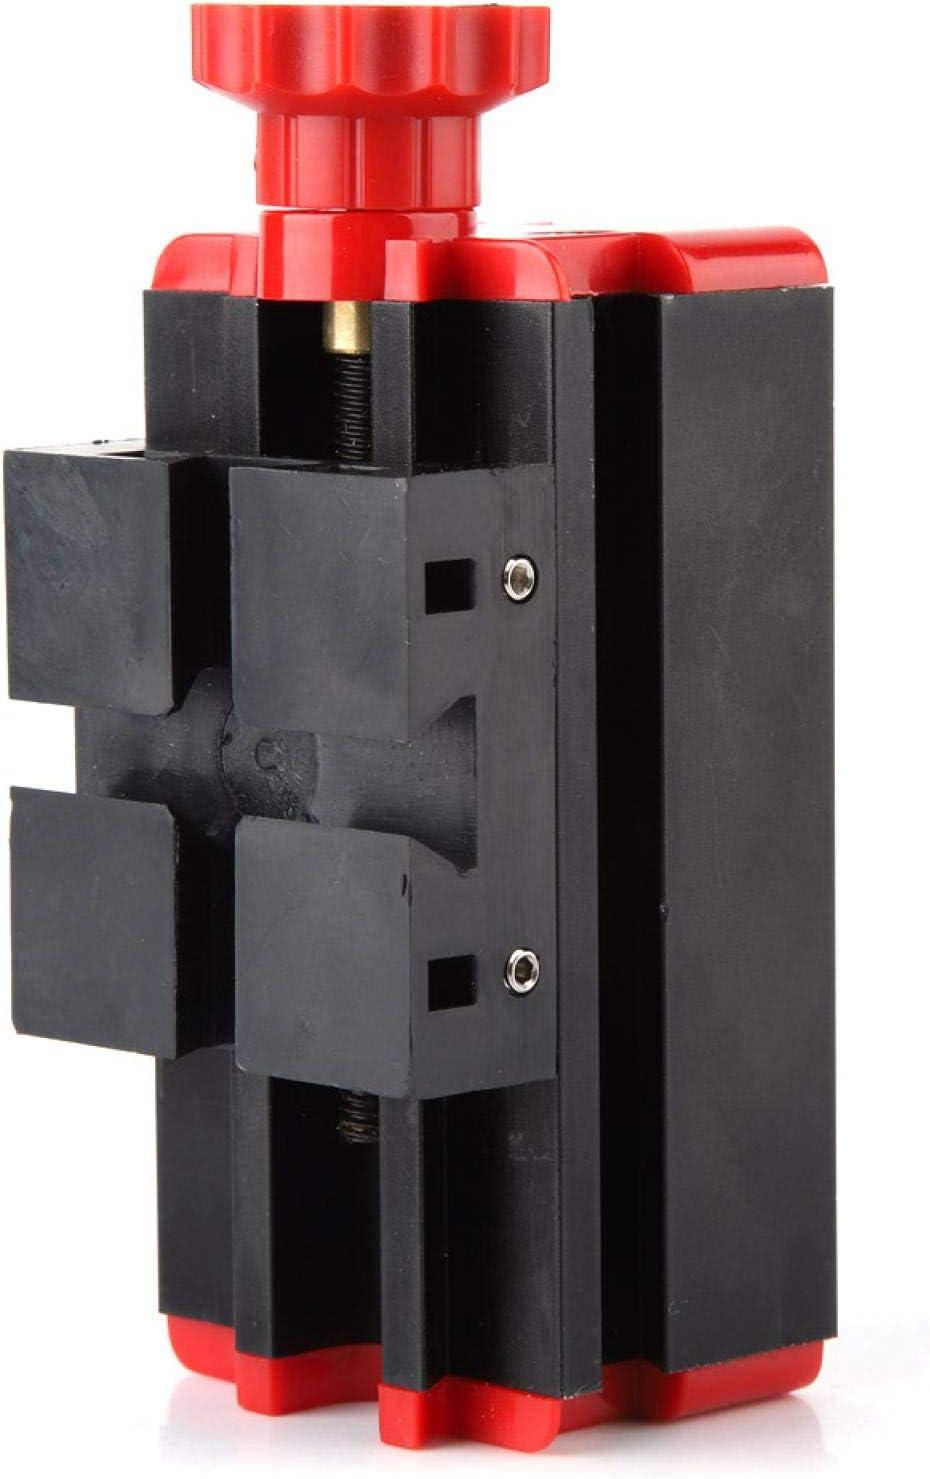 Wear Resistant Anti-Impact Z009 Reservation Longitudinal L Slide Now free shipping Mini Block